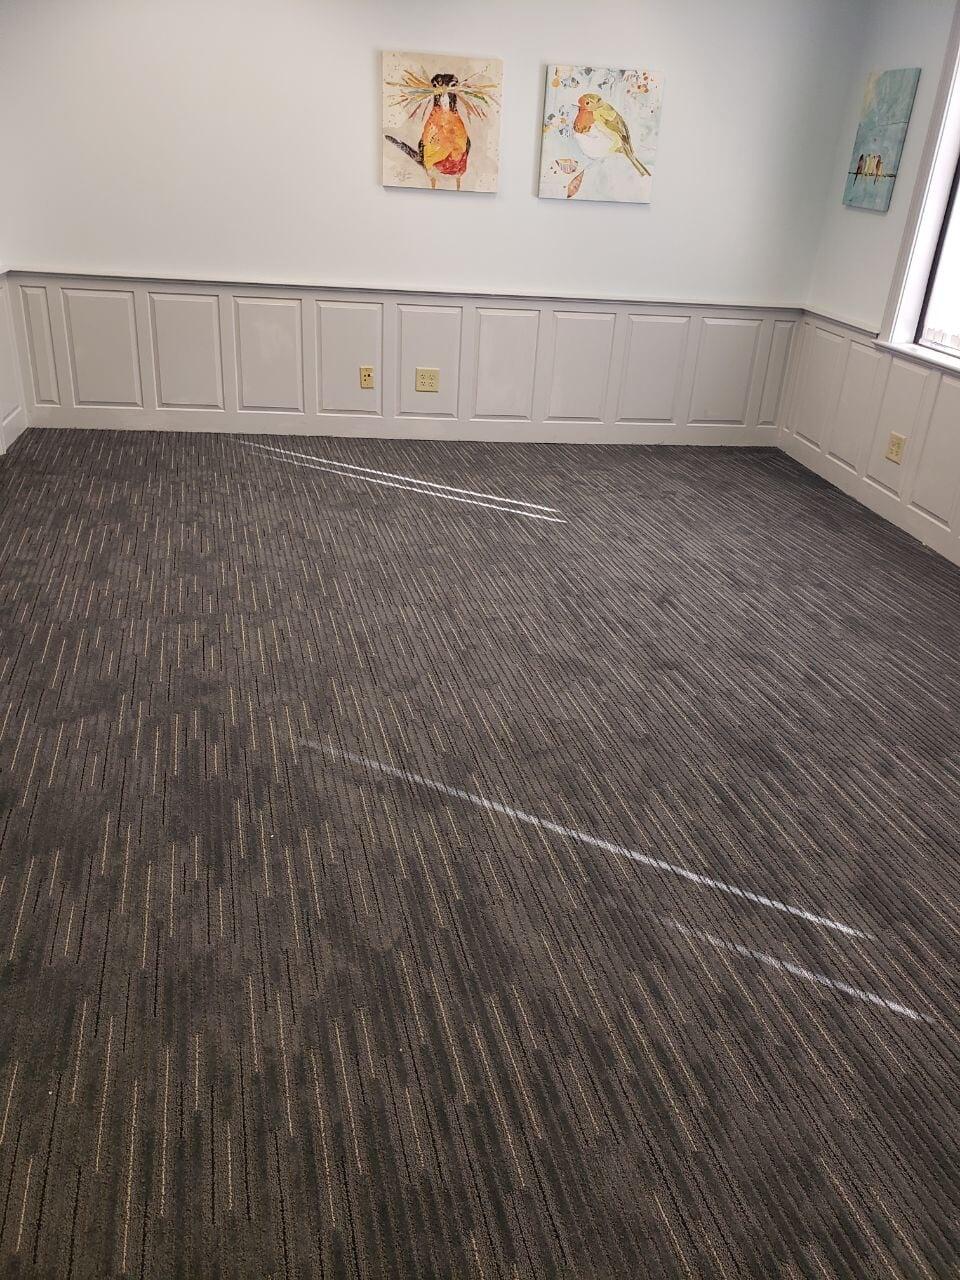 Beautiful textured carpet in Gallatin, TN from Absolute Flooring Inc